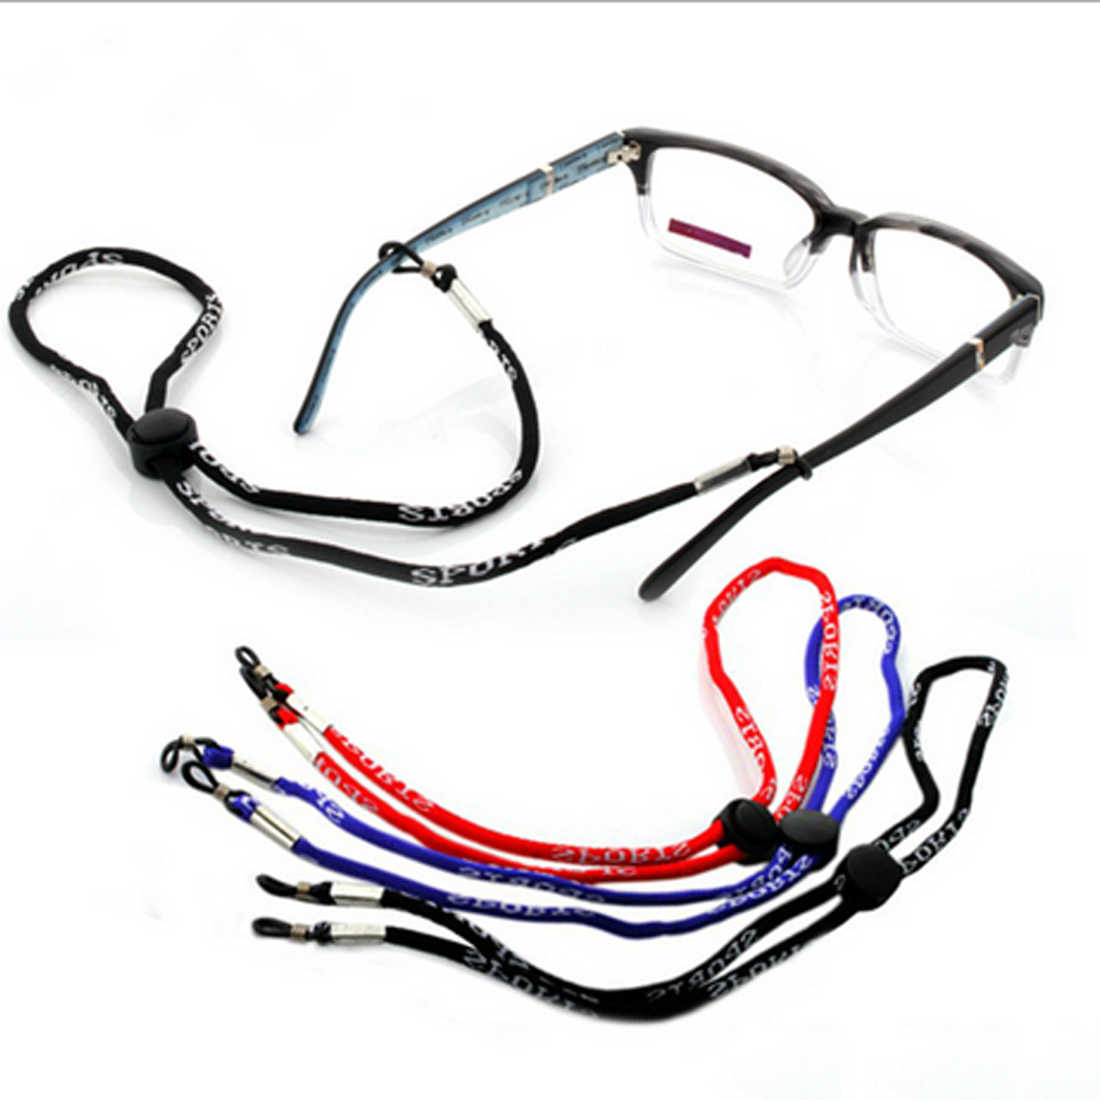 24dacffcb83 New Adjustable Sunglasses Neck Cord Strap Glasses String Lanyard Holder 1Pc  New Leather Eyeglass Cord Adjustable